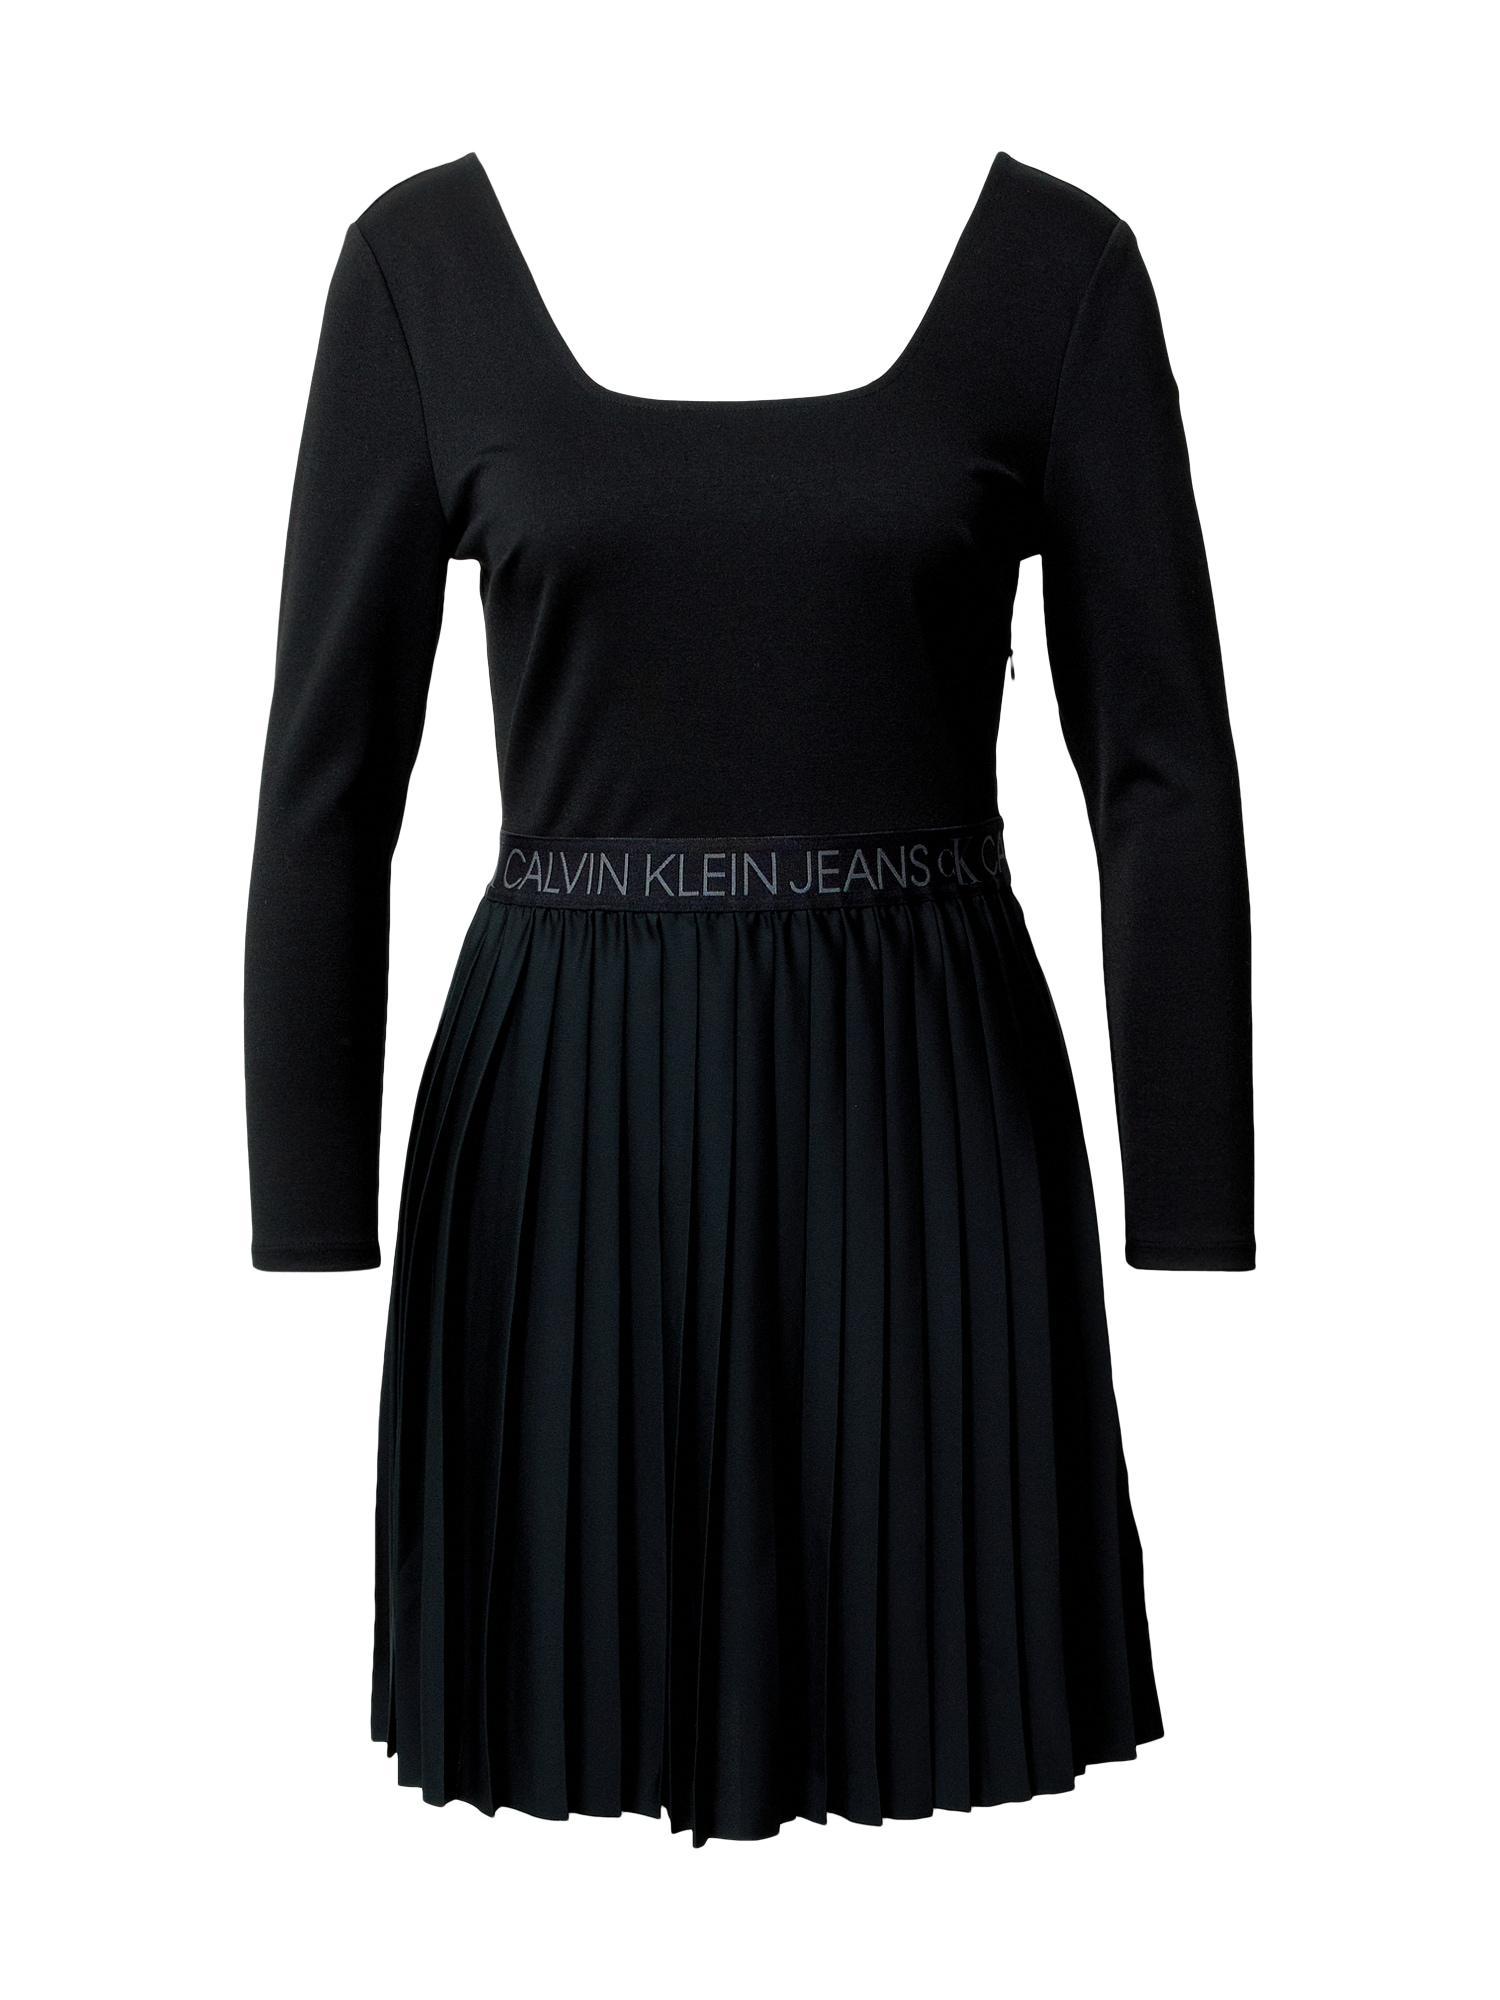 Calvin Klein Jeans Suknelė juoda / pilka